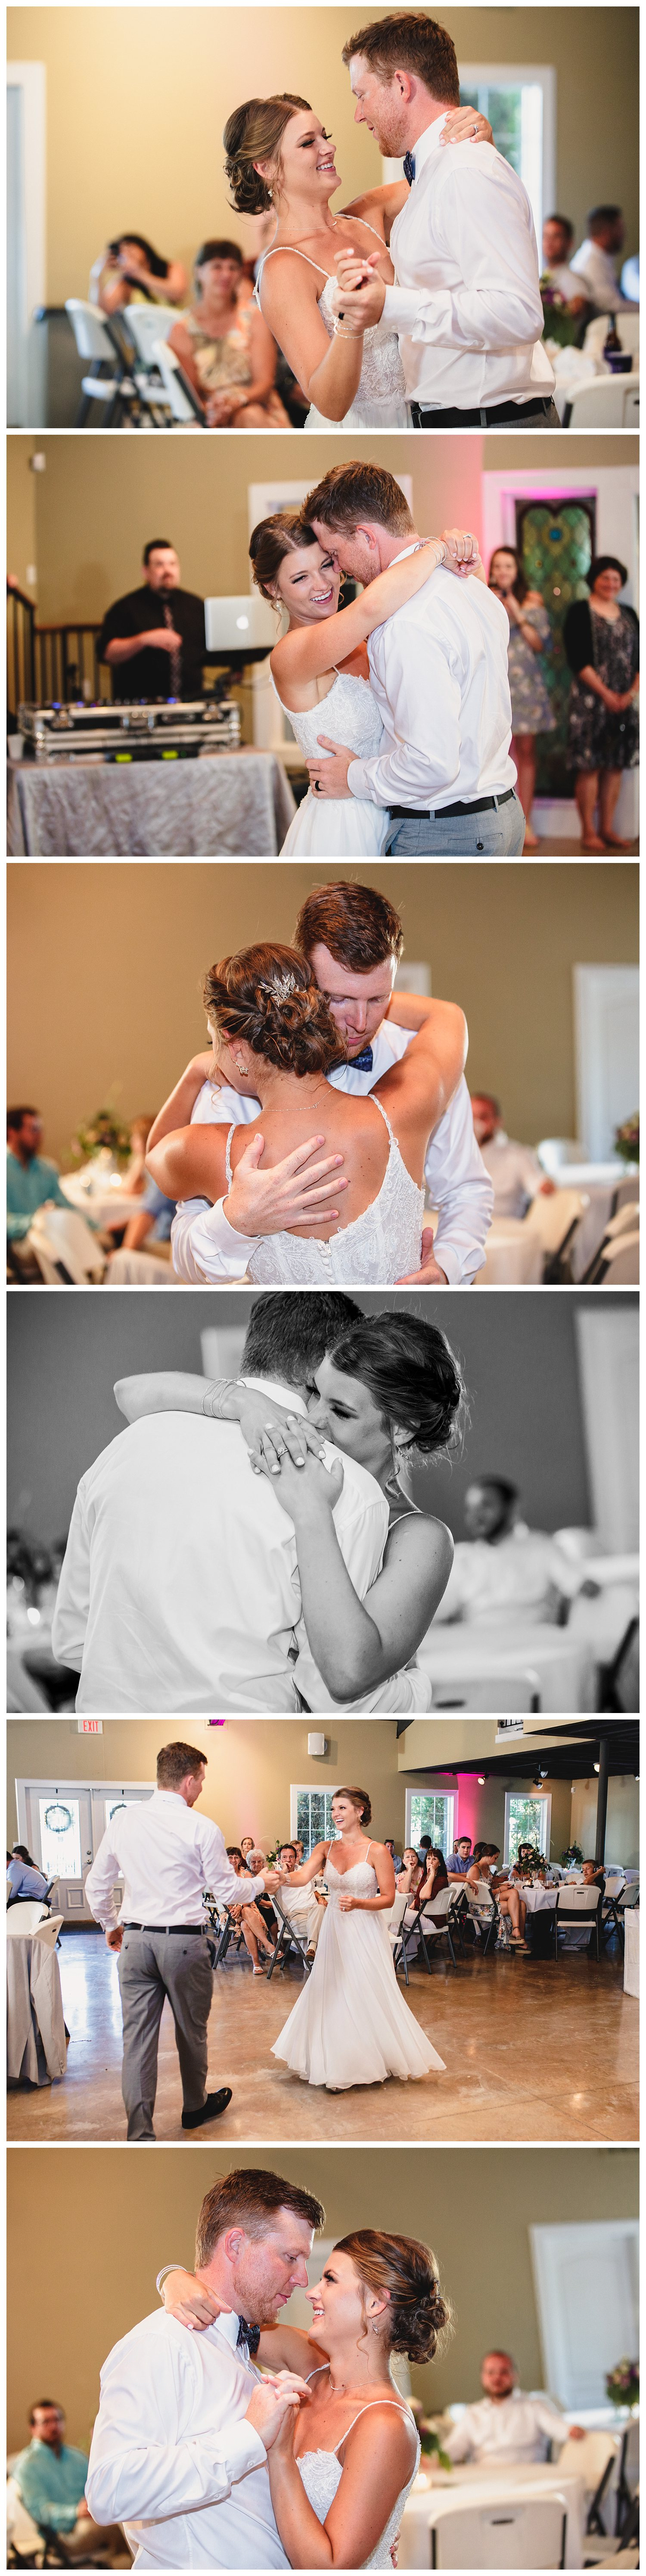 Kelsey_Diane_Photography_Kansas_City_Engagement_Wedding_Photographer_Midwest_Traveling_Missouri_Lee_Andrew_Hall_And_Garden_Blue_Springs_Wedding_Clayton_Kimberly_Summer_Wedding_0845.jpg